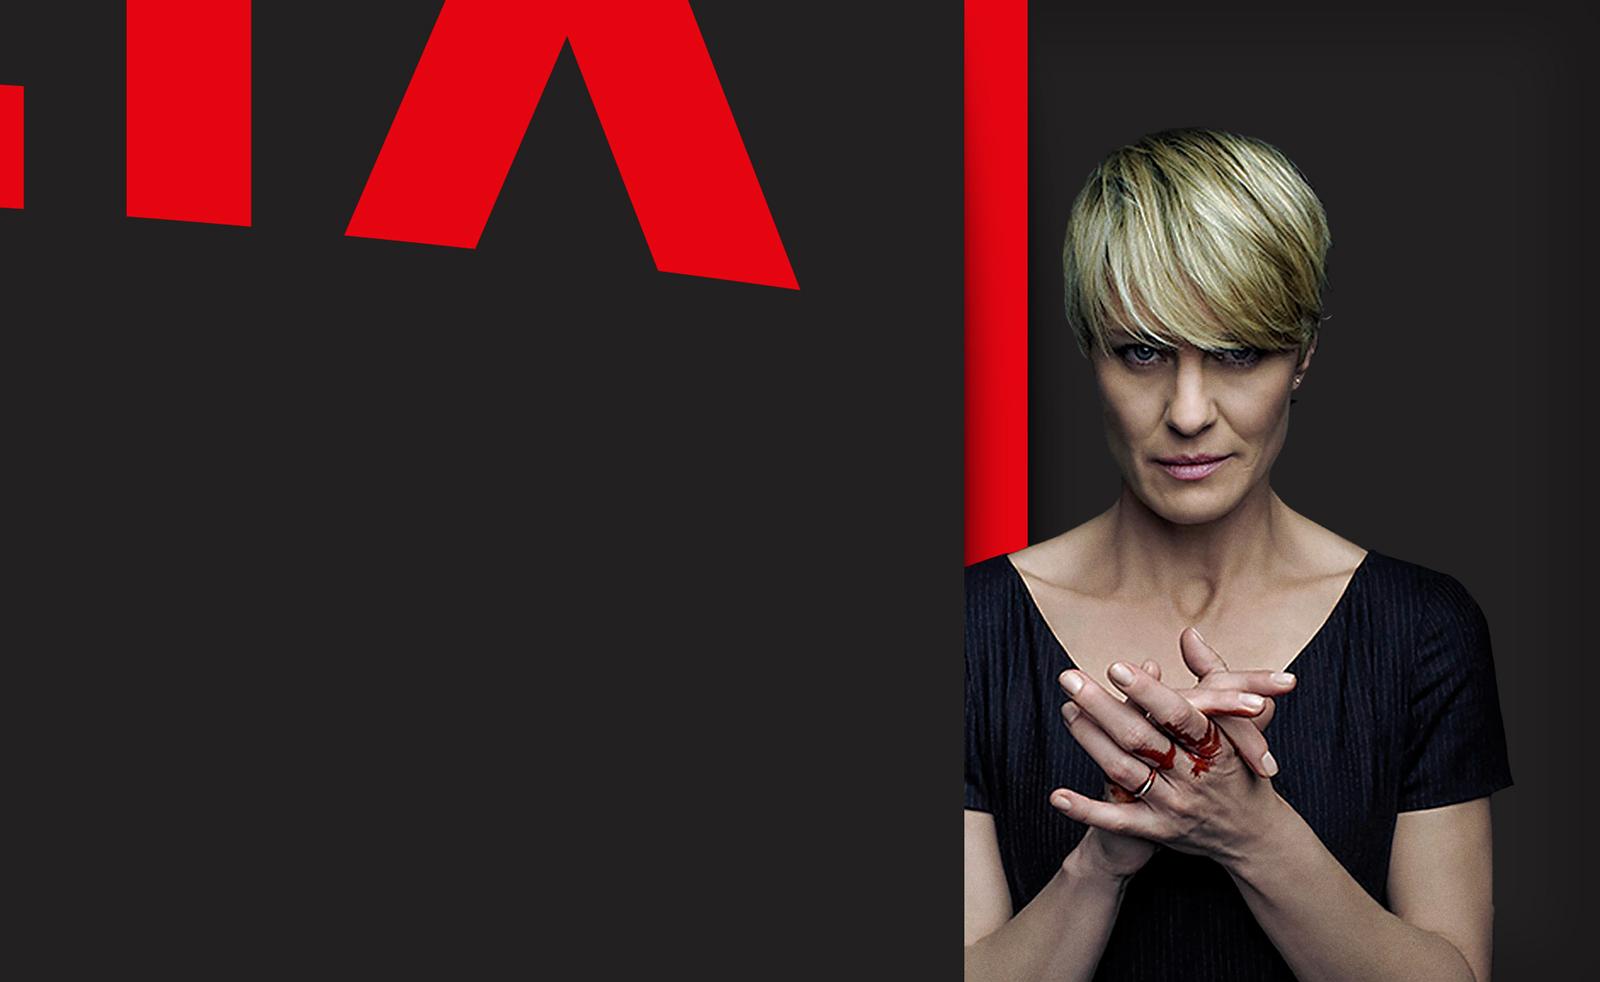 Nueva Identidad corporativa para Netflix